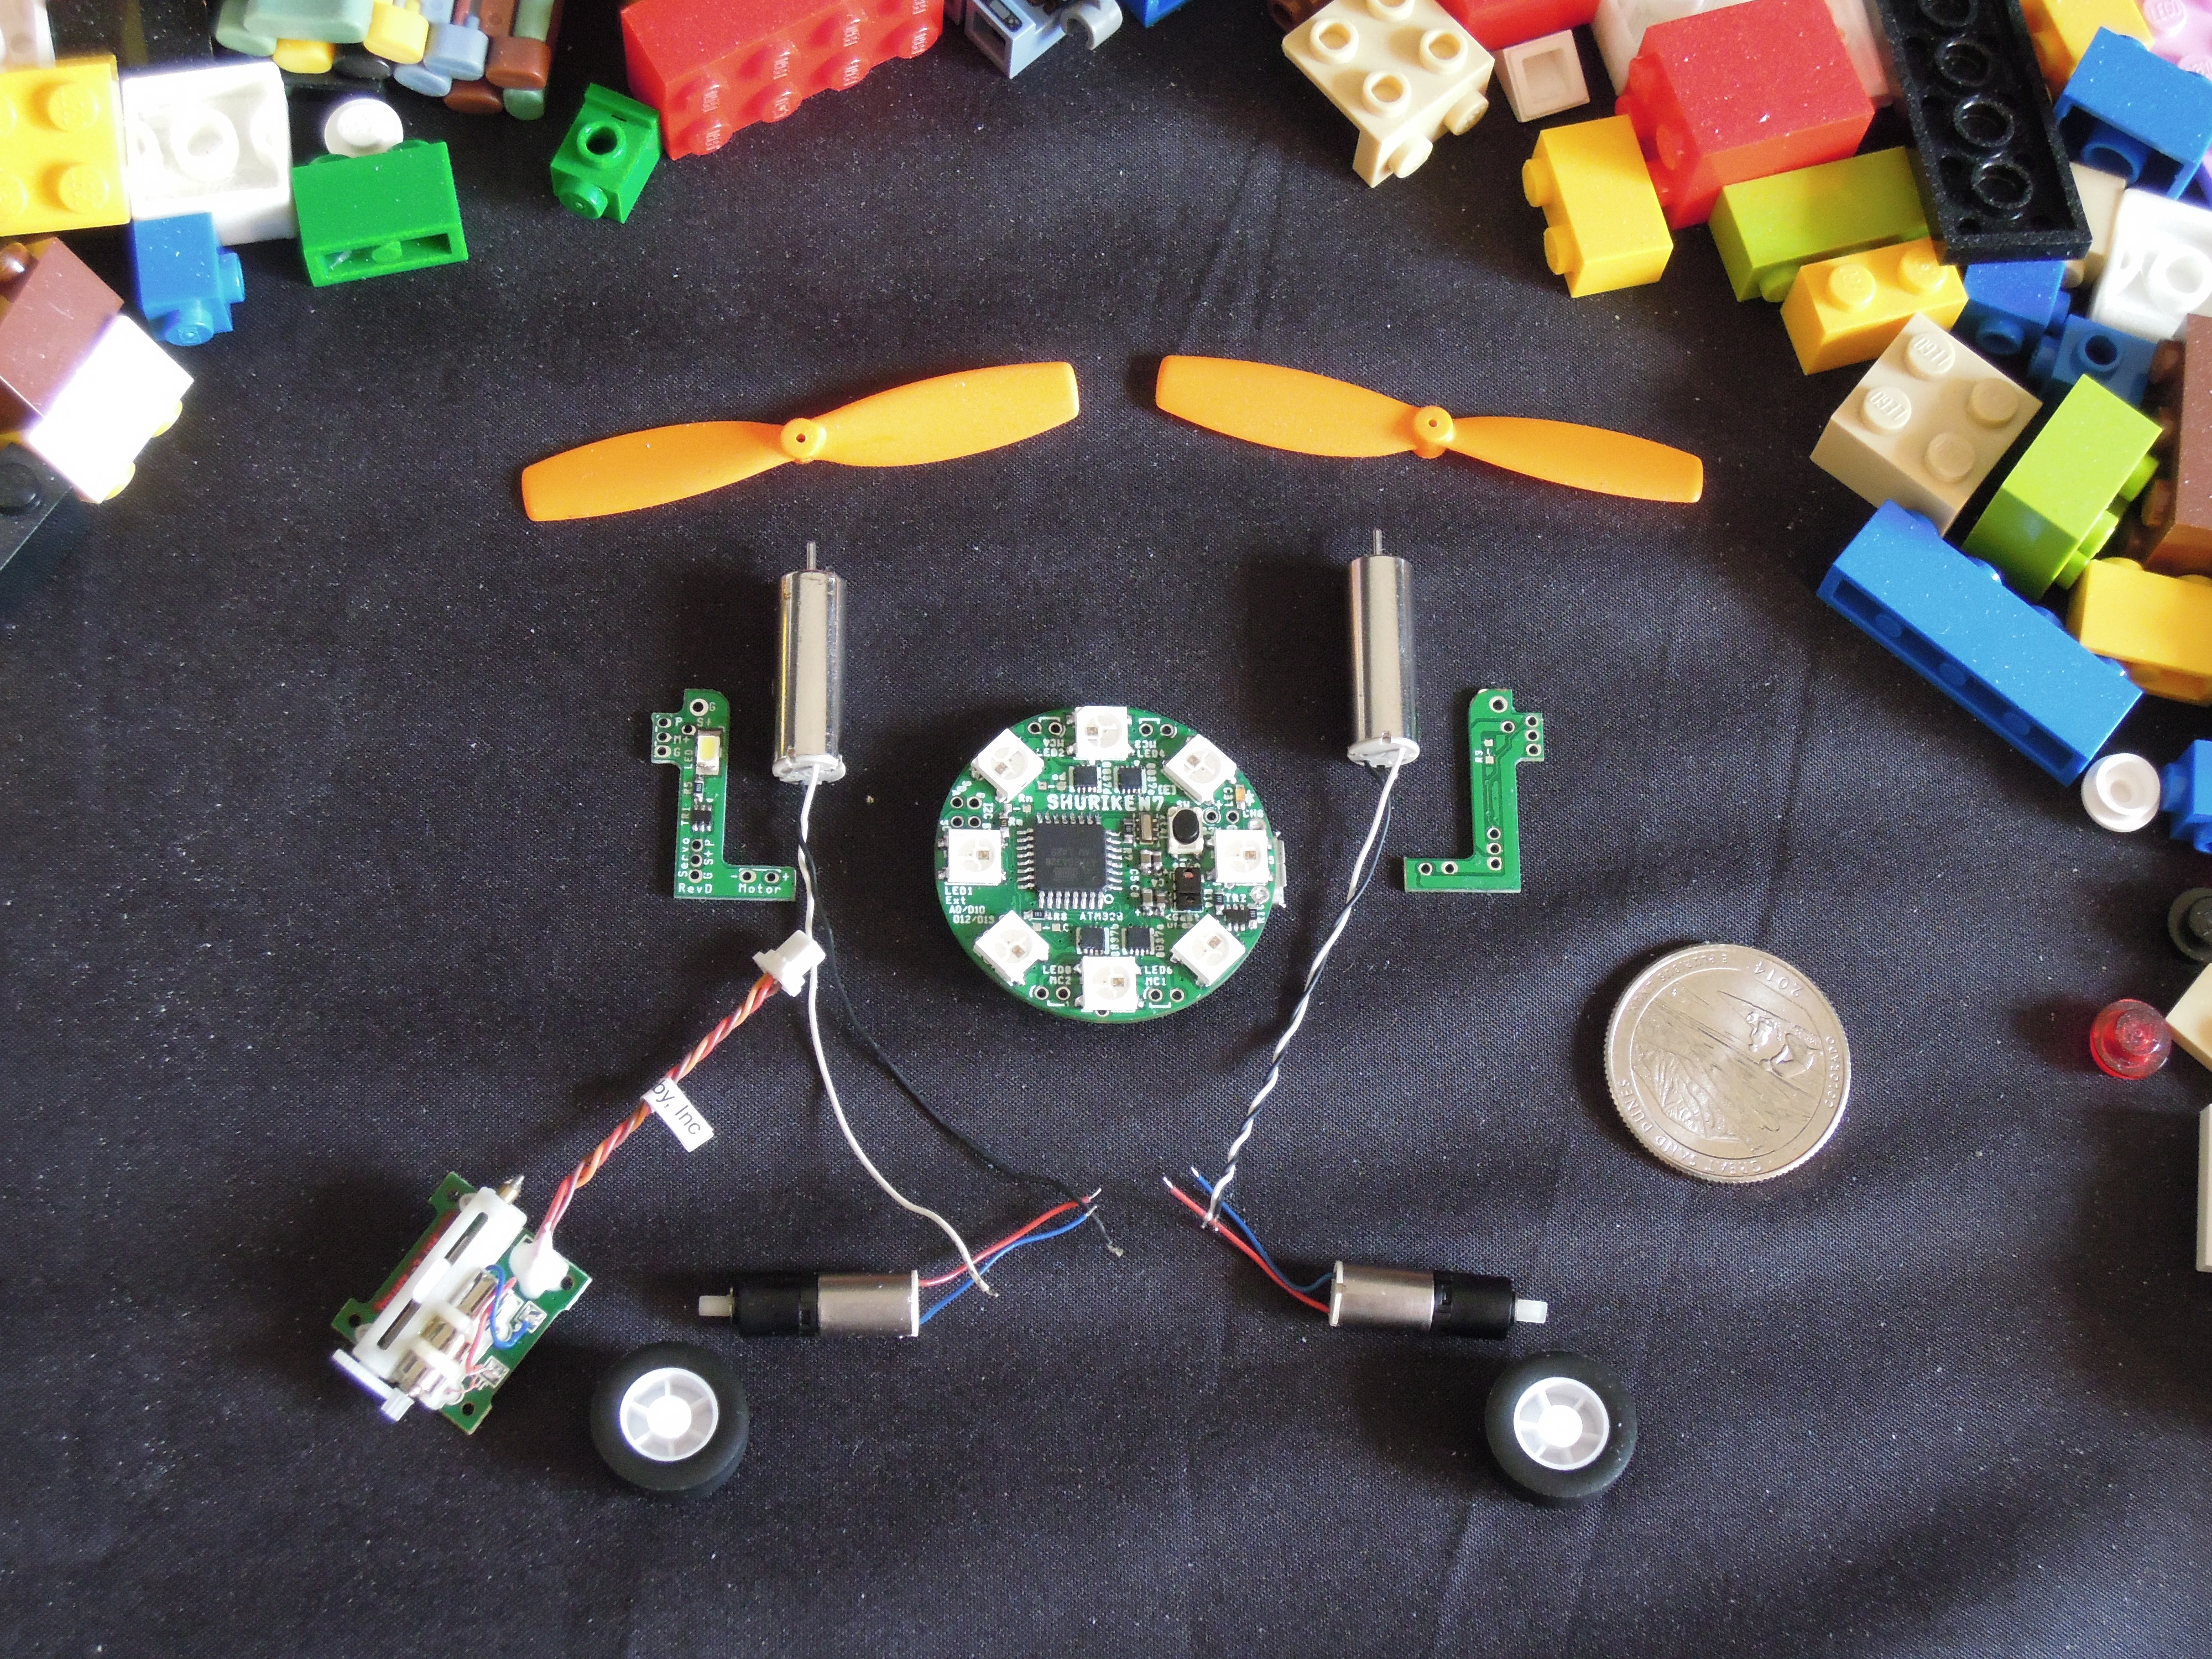 DSCN6463.JPG Download free STL file Small Humanoid Robot • 3D printable design, choimoni